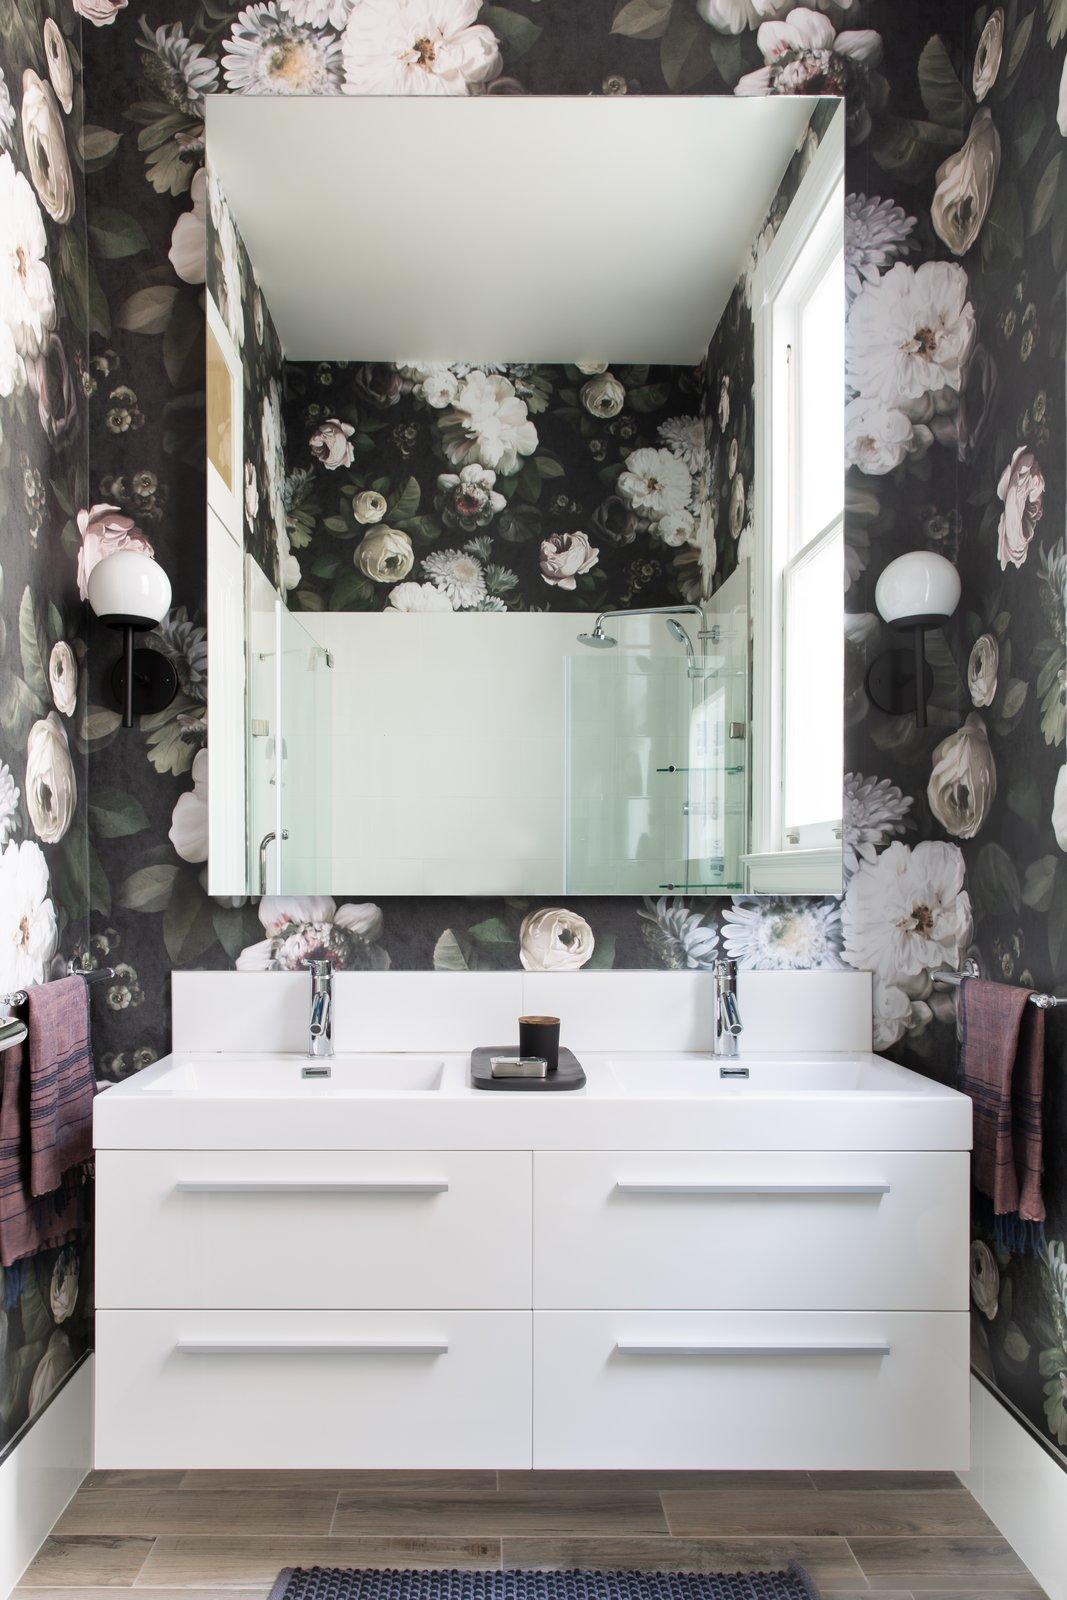 Bath Room, Wall Mount Sink, Ceramic Tile Floor, and Wall Lighting Powder Room  Moody Mission Victorian by Regan Baker Design